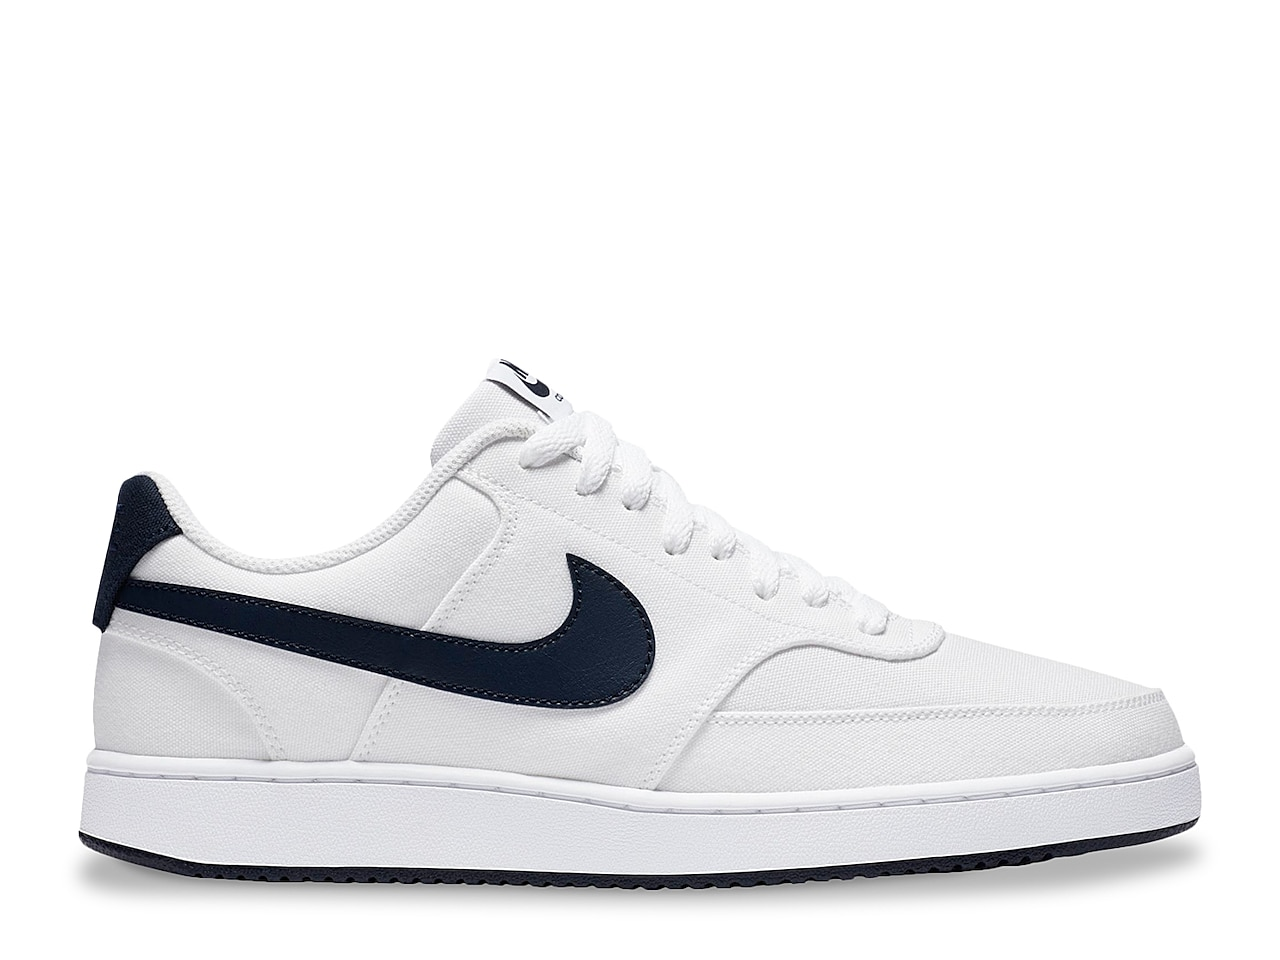 Nike Court Vision Low Sneaker - Men's